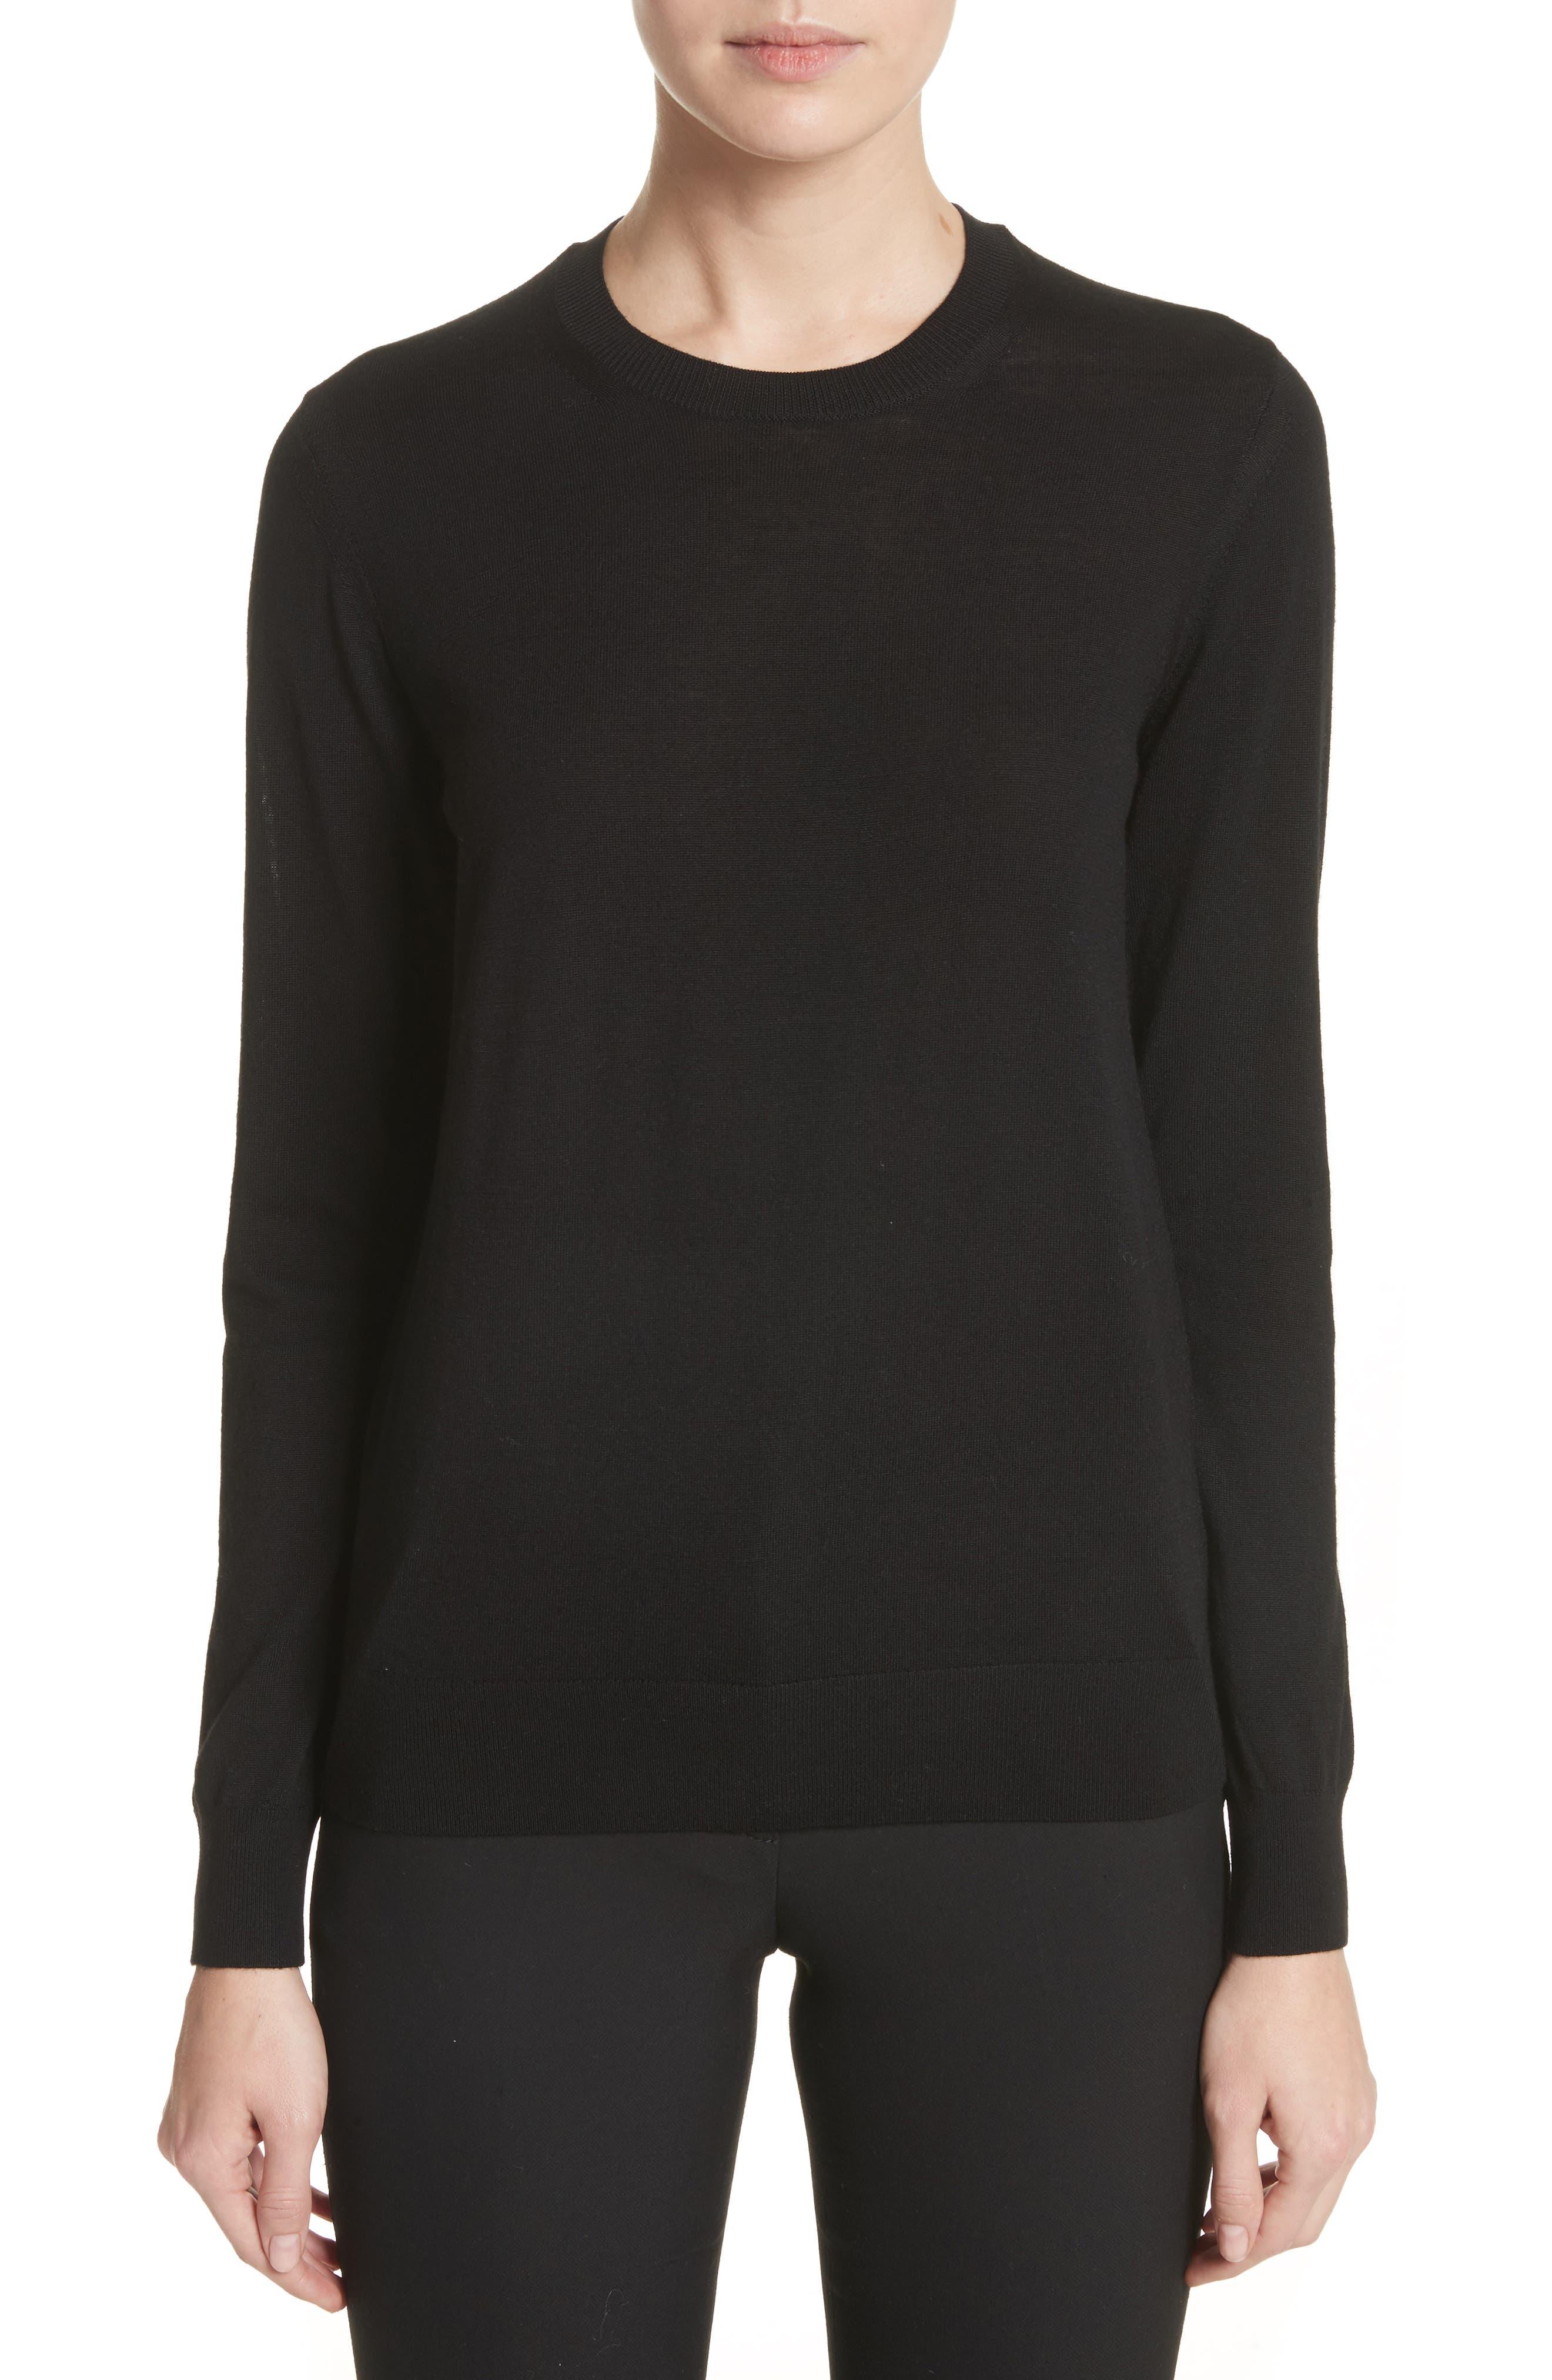 BURBERRY,                             Viar Merino Wool Sweater,                             Main thumbnail 1, color,                             001